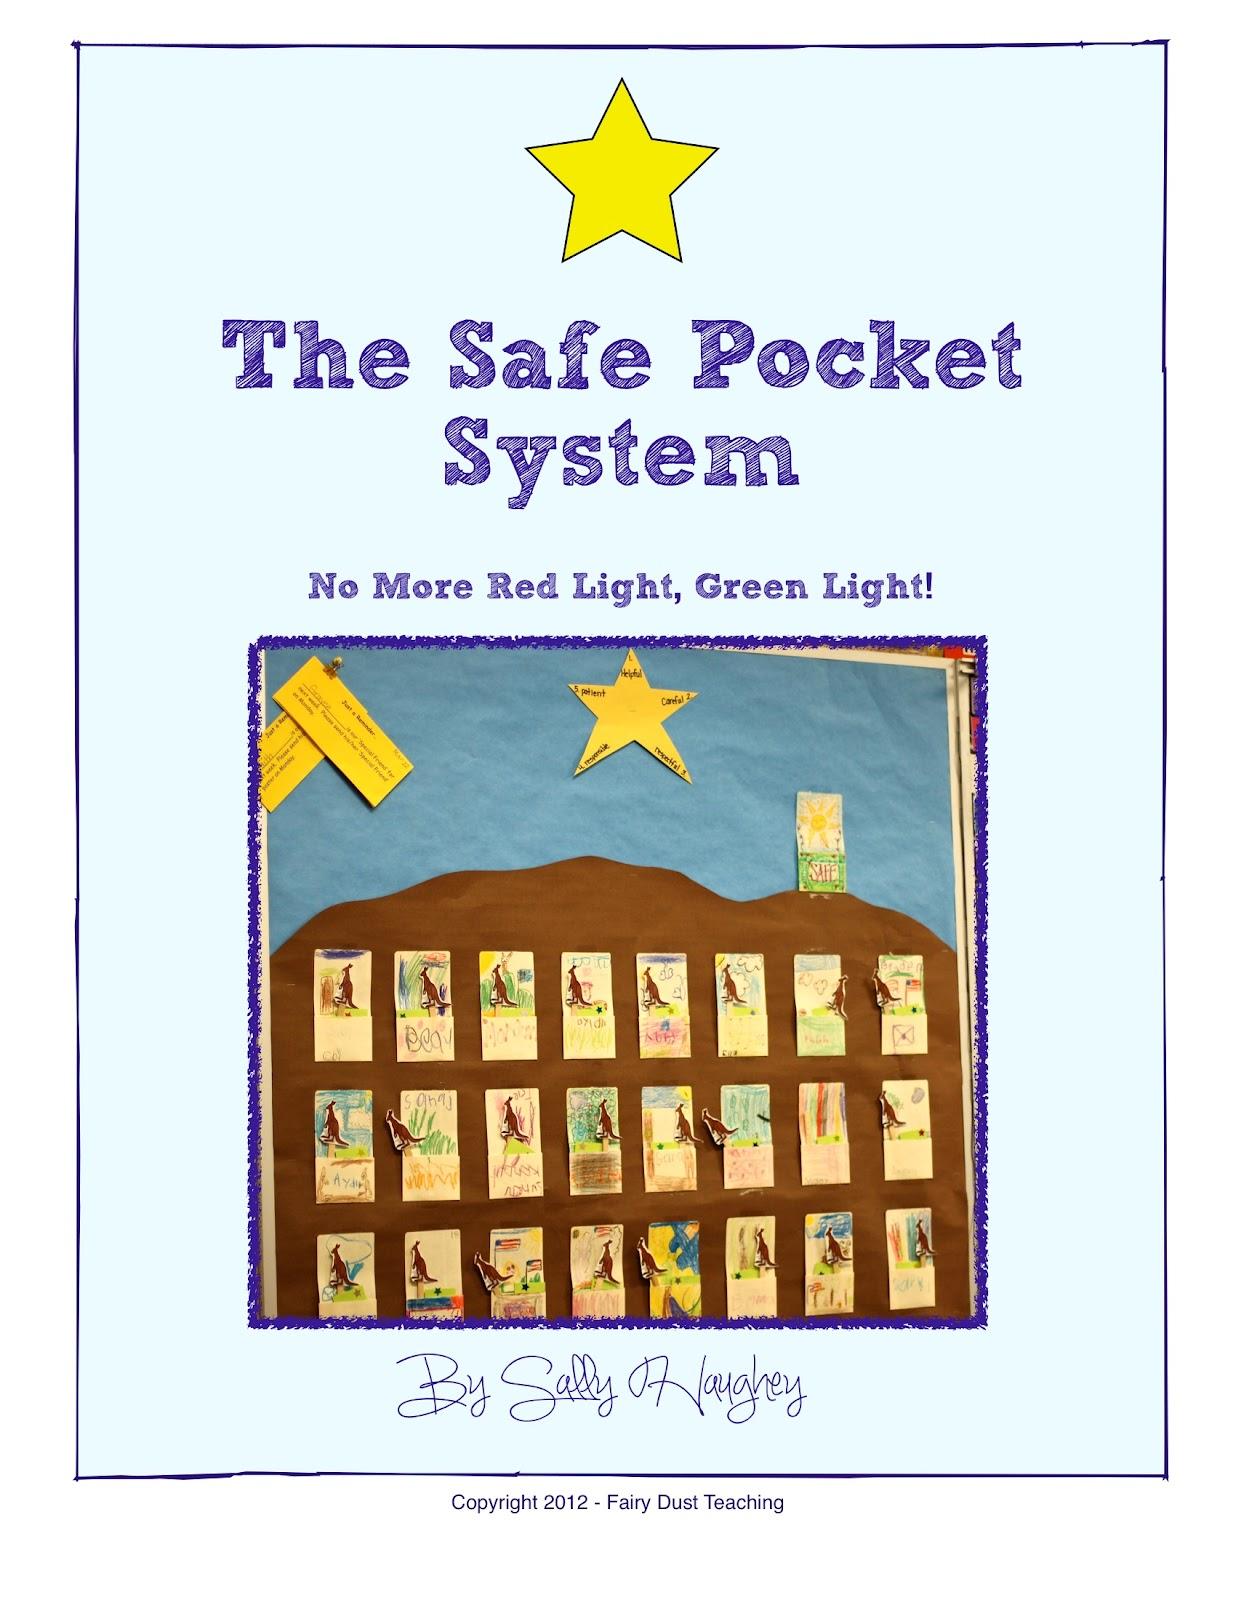 No More Green Light Yellow Light Red Light Behavior Management